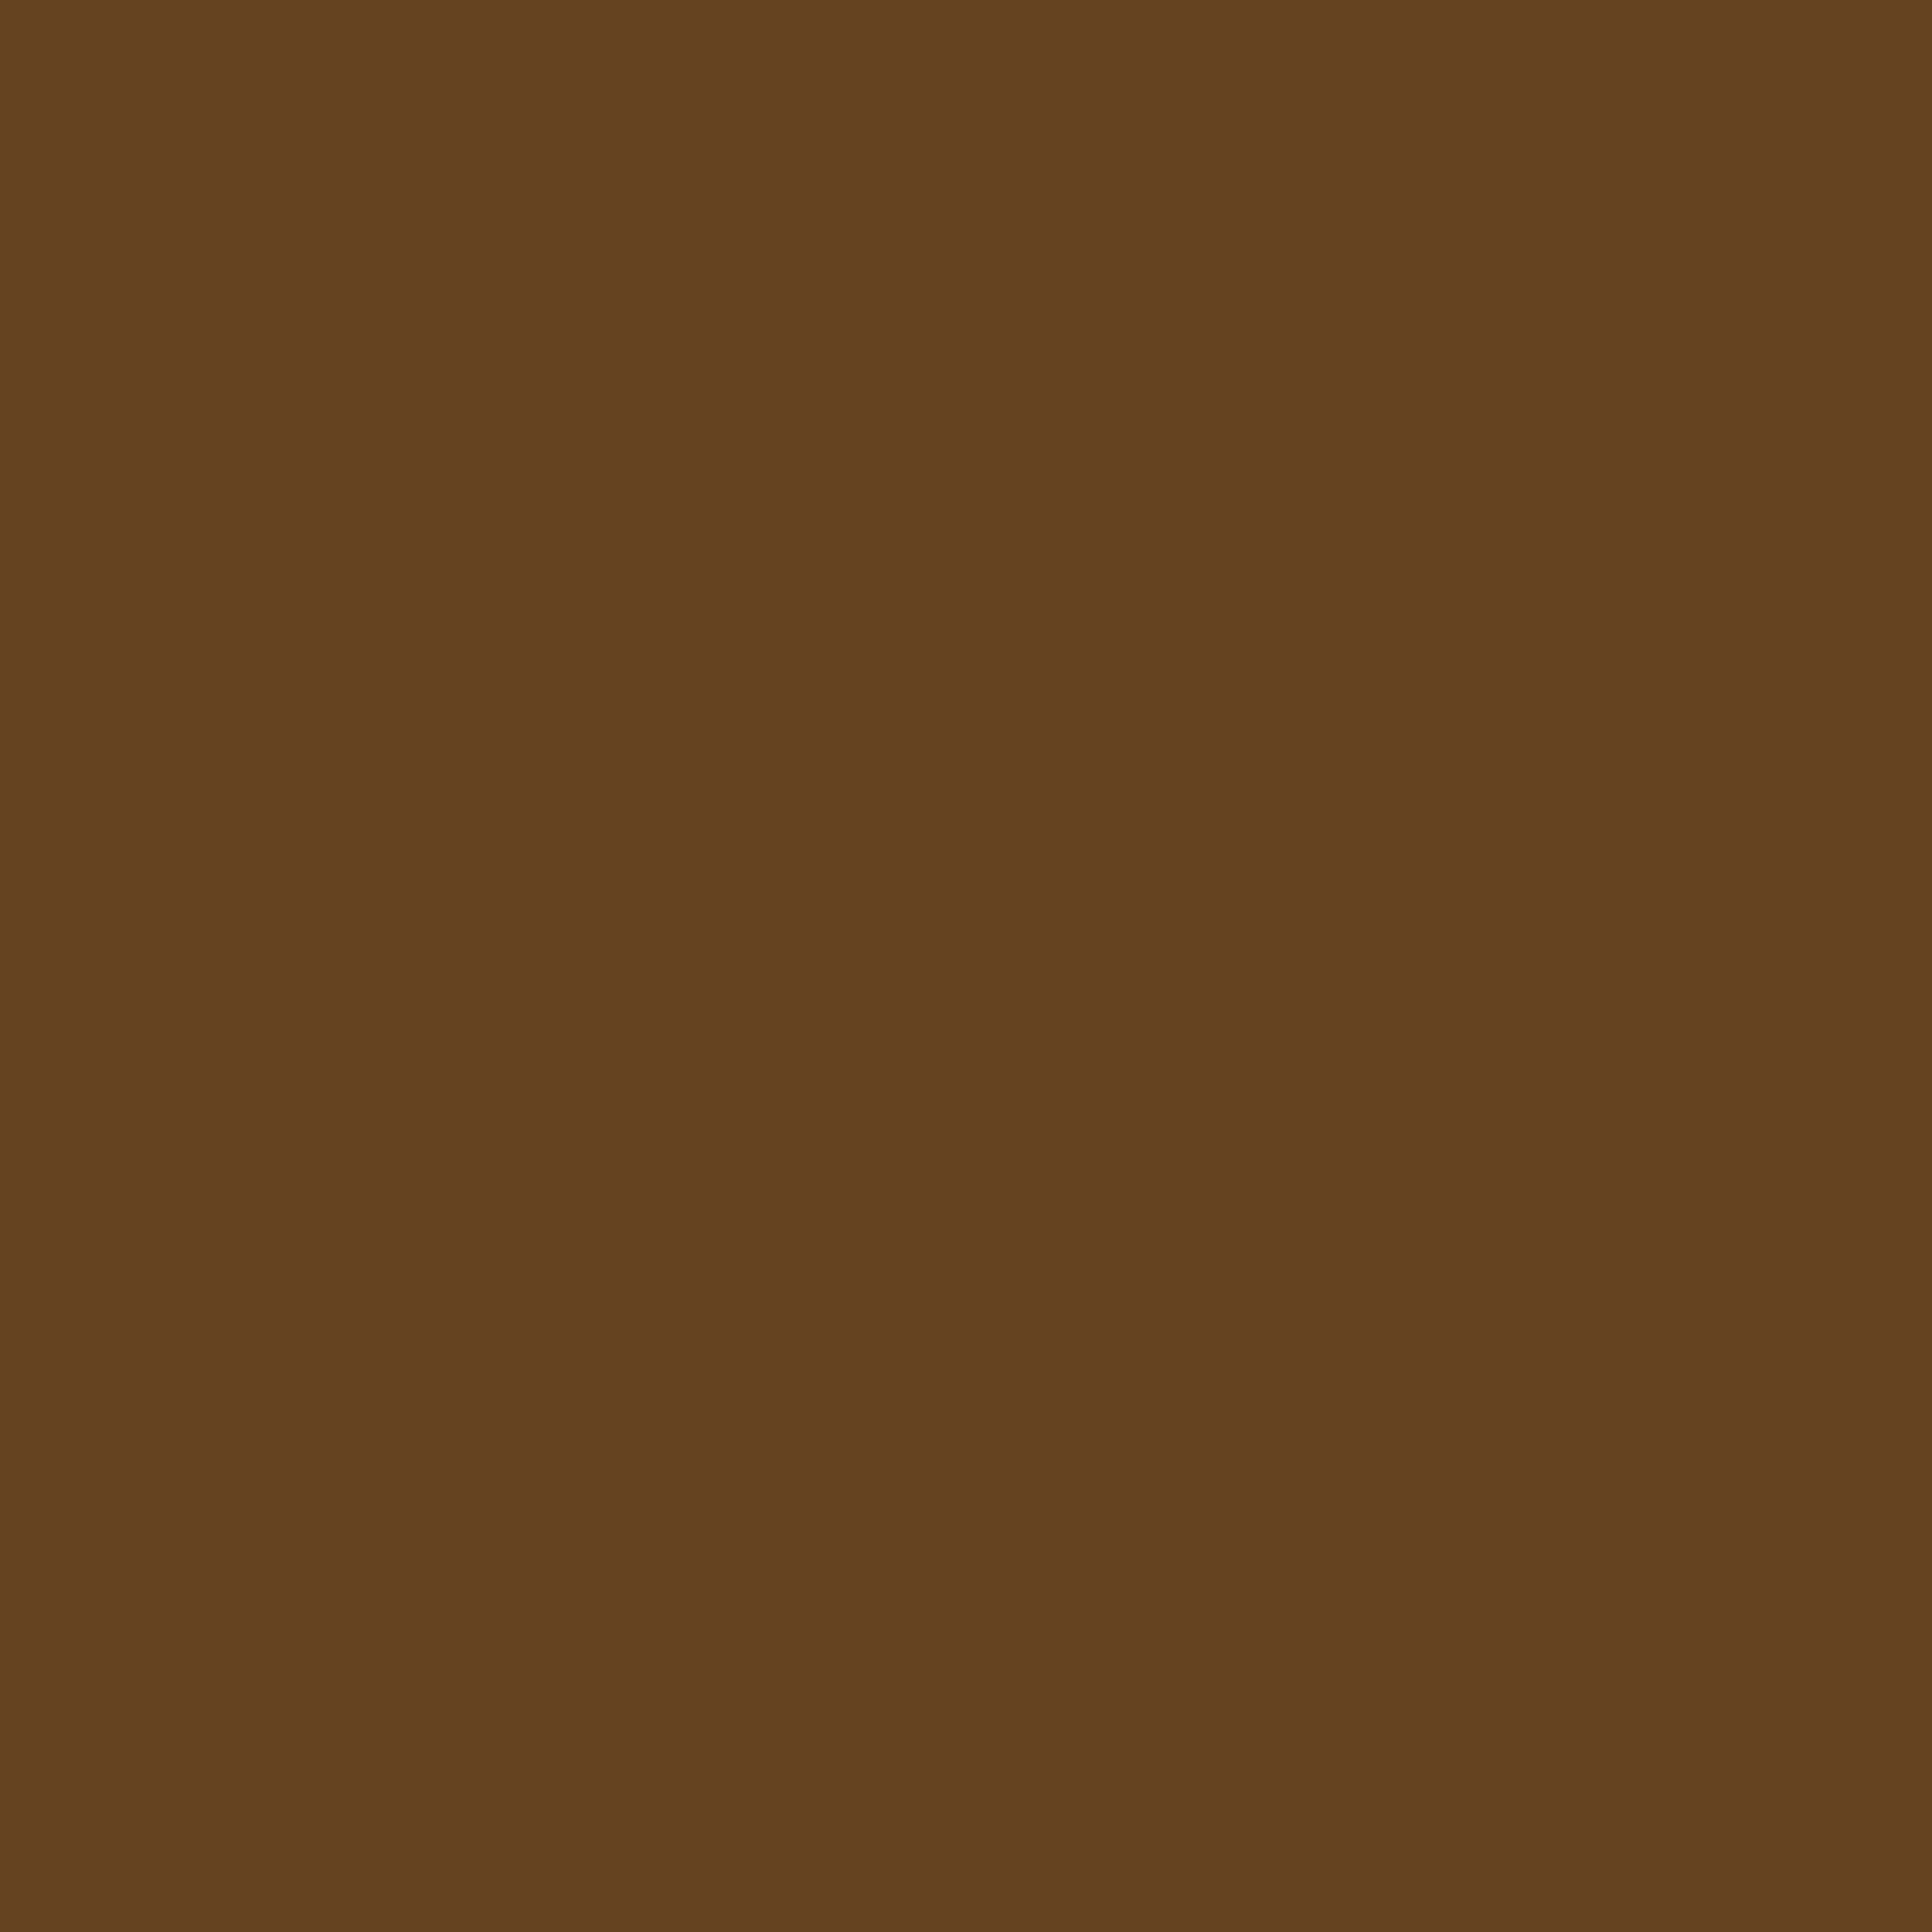 3600x3600 Dark Brown Solid Color Background